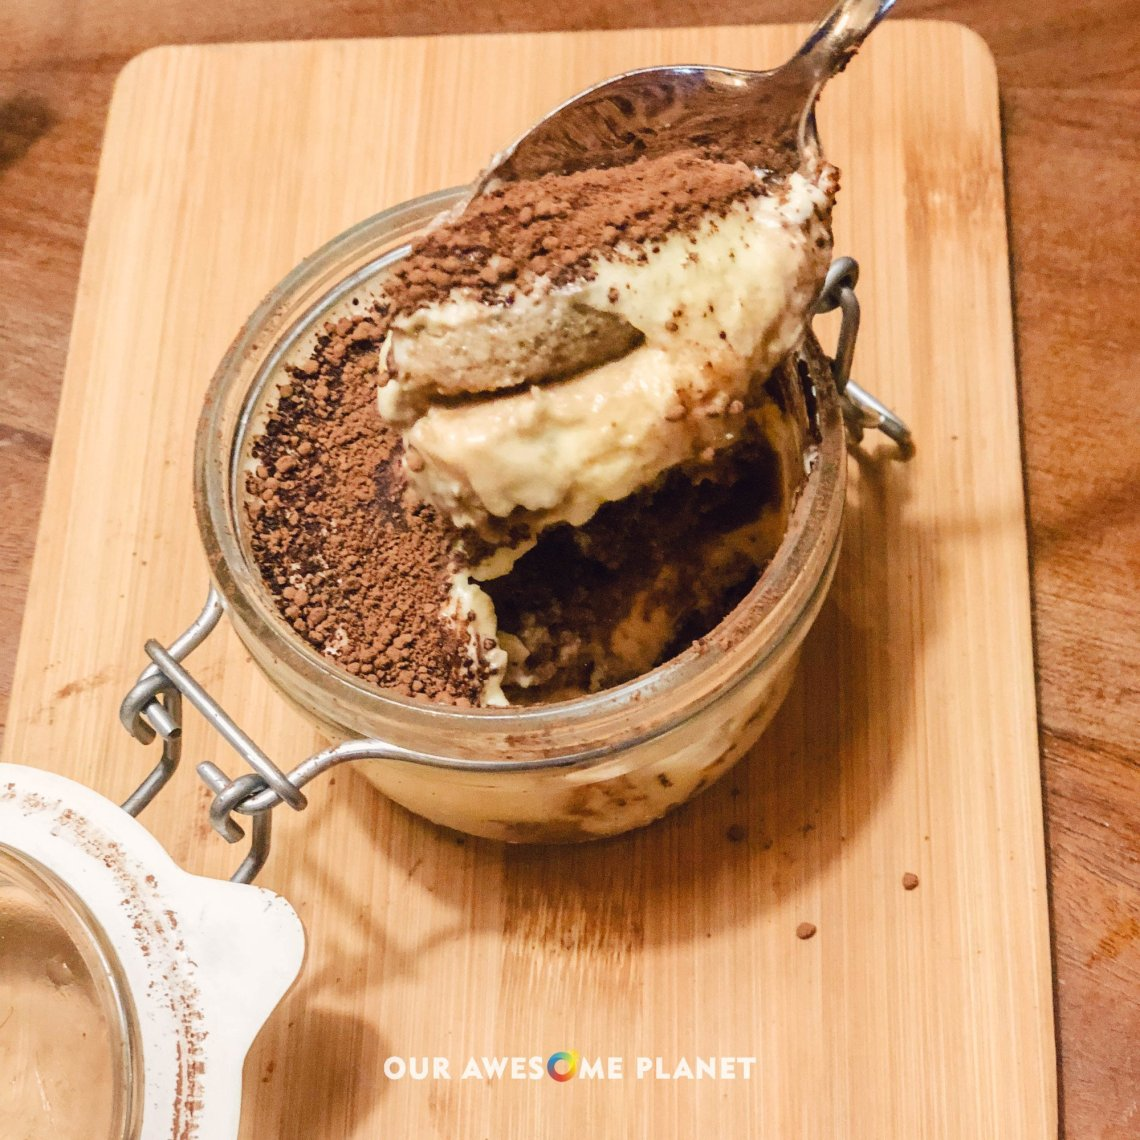 Tiramisu (₱395). Mascarpone mousse, disaronno, coffee cake, cacao